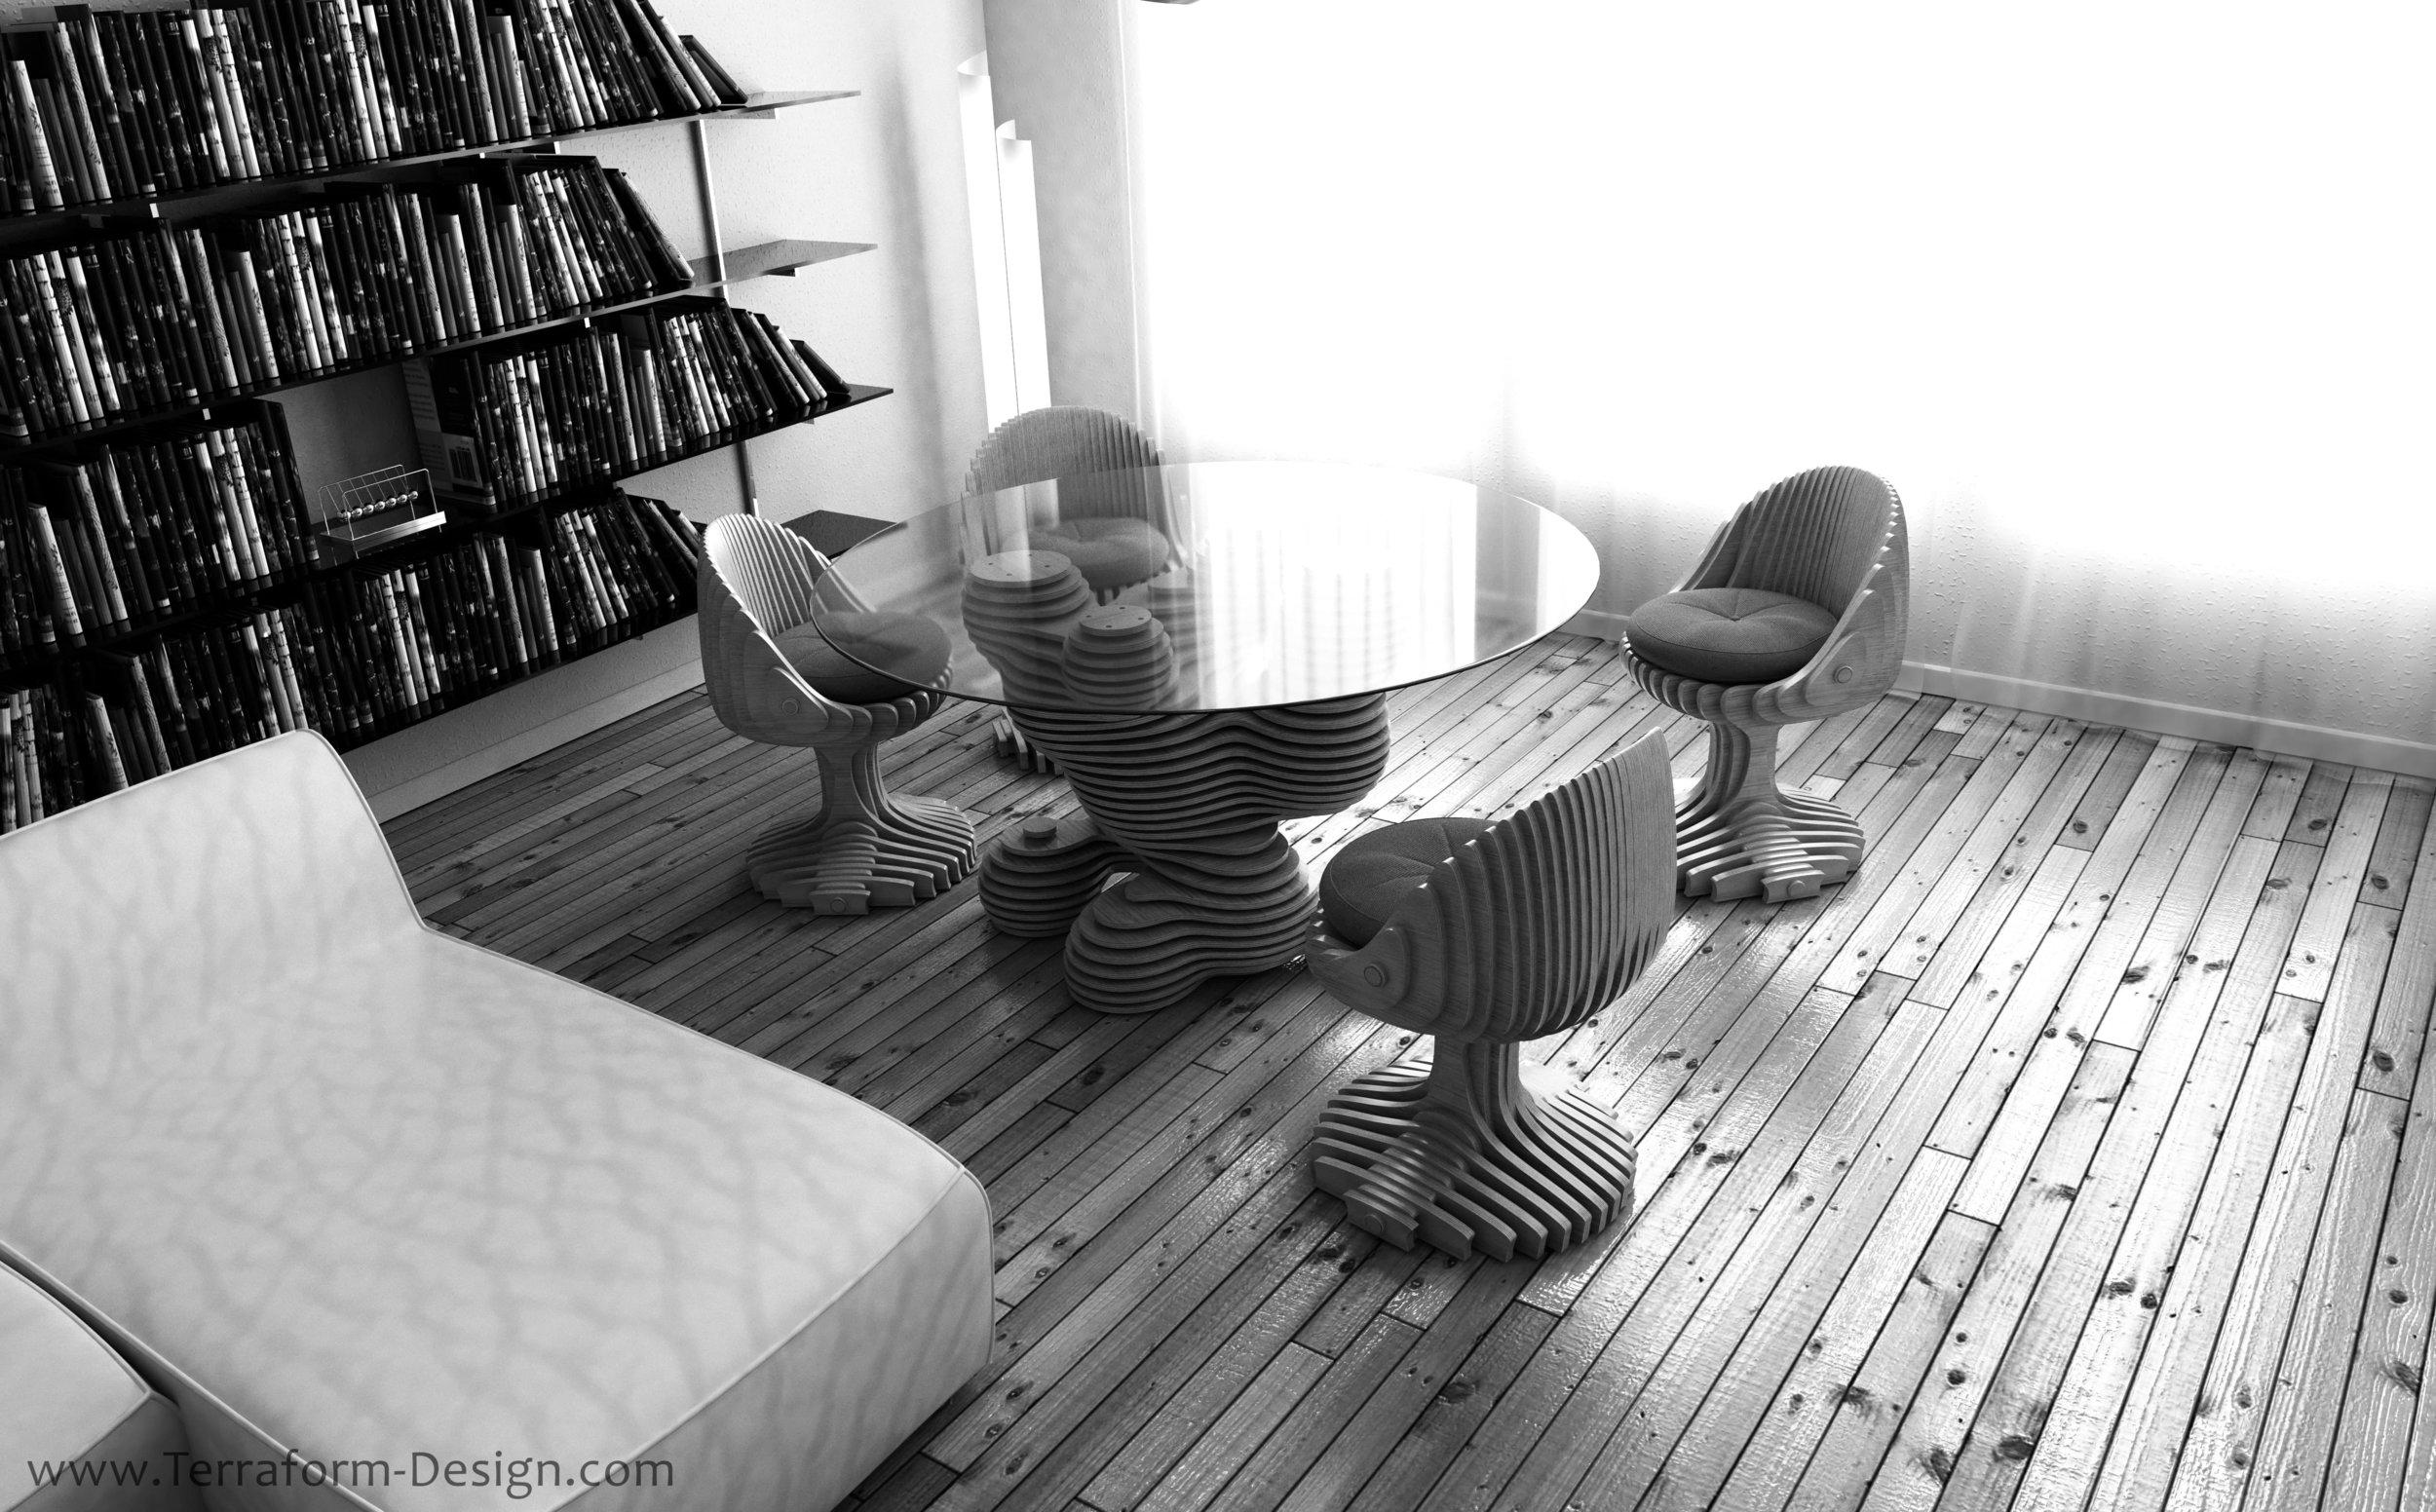 orbitalis classic 3 w – sectioned parametric furniture cnc router postmodern organic geometric plywood table terraform design.jpg